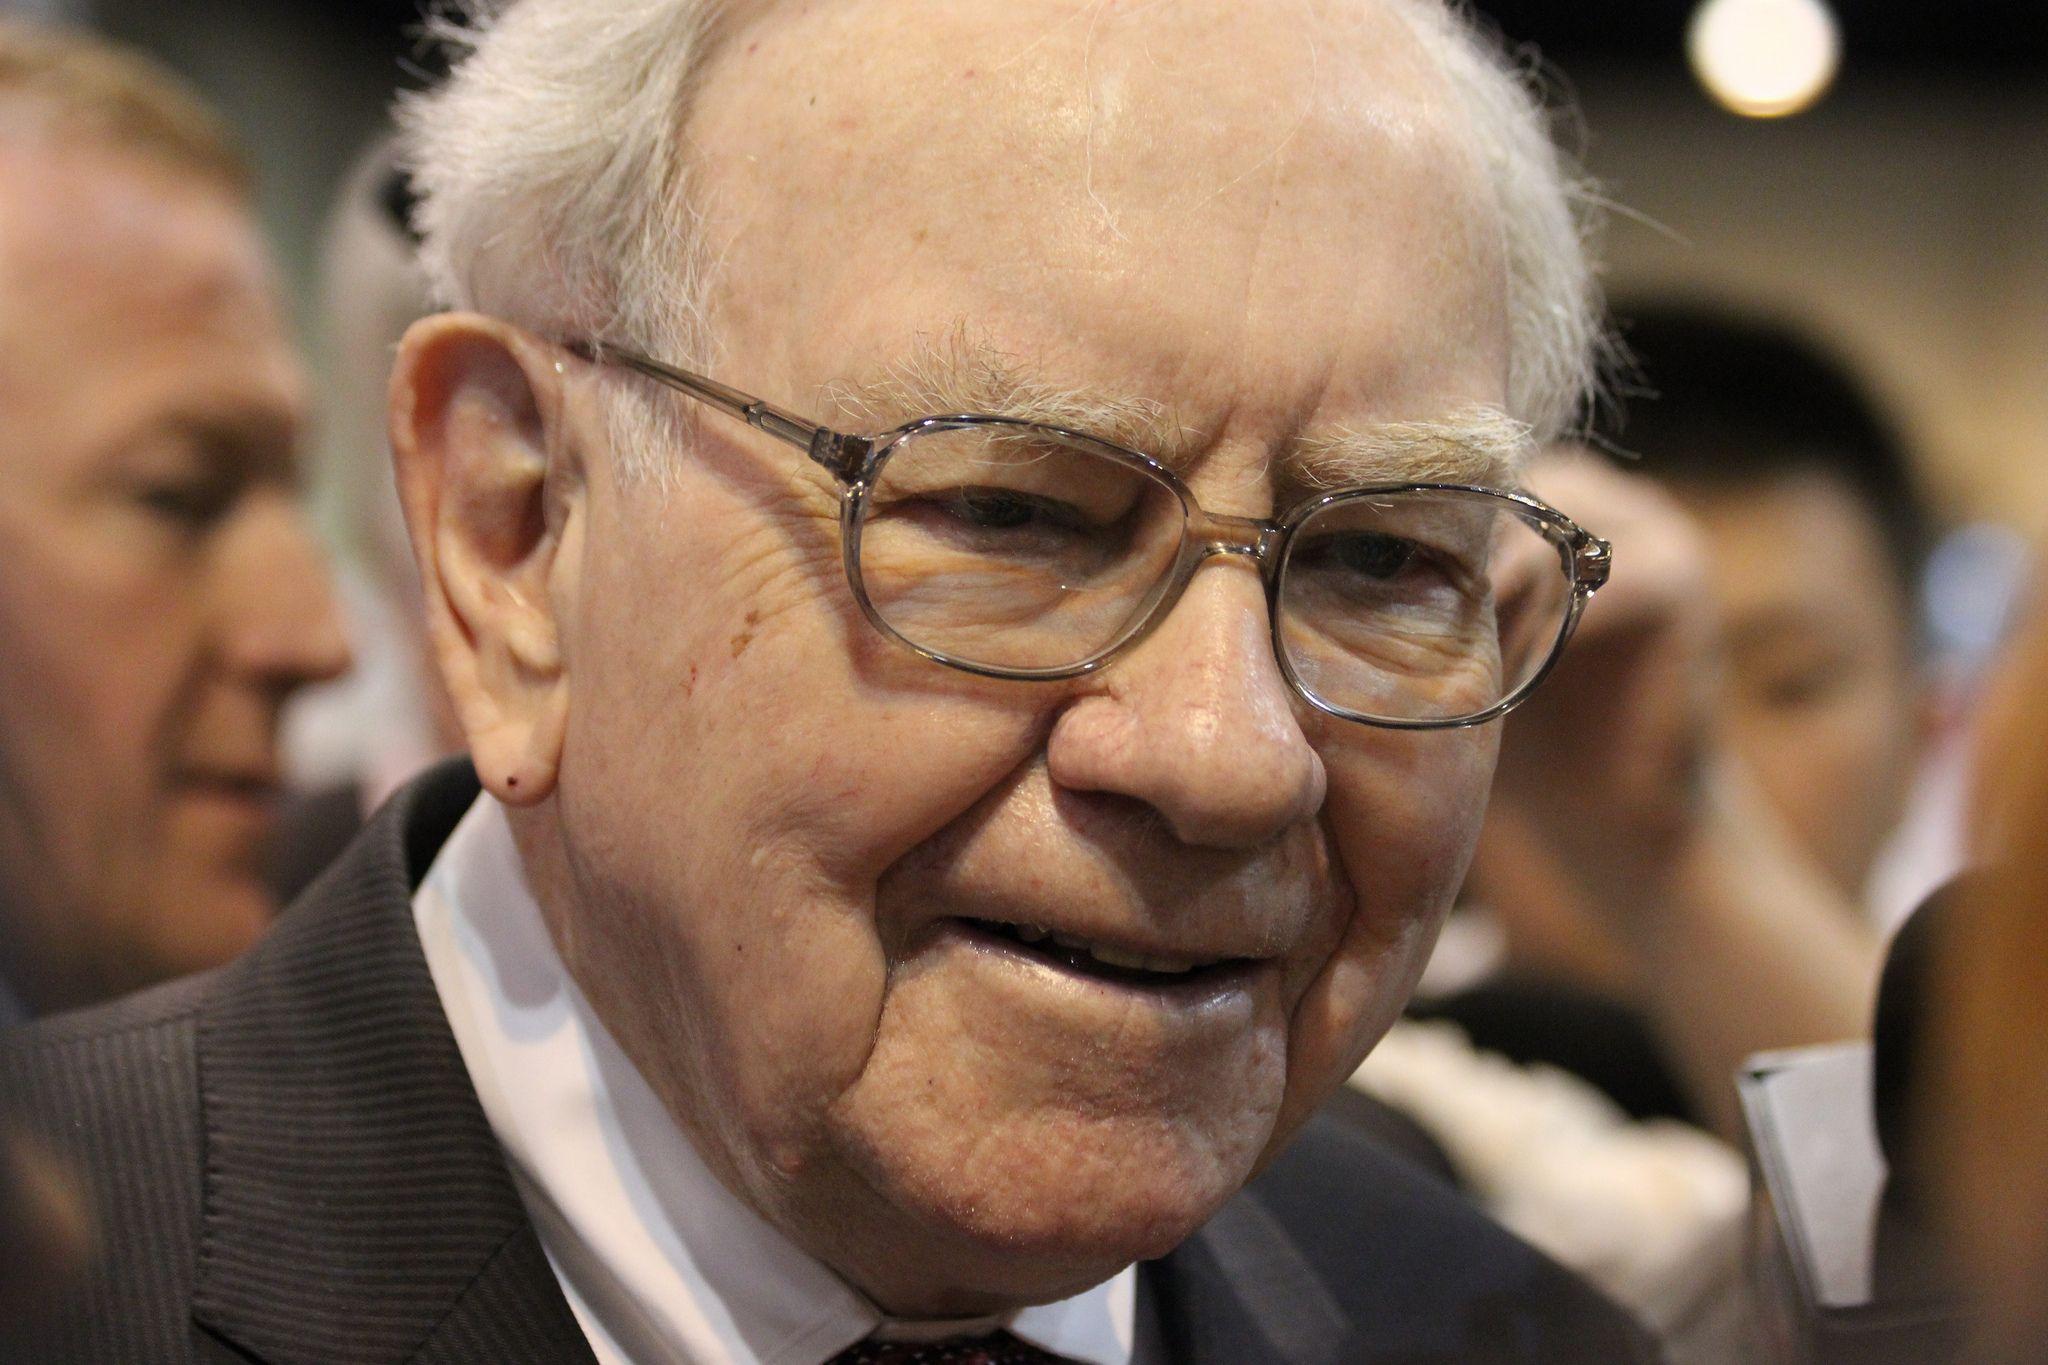 Wondrous Warren Buffett His Best Stocks Investing Strategies And Download Free Architecture Designs Scobabritishbridgeorg